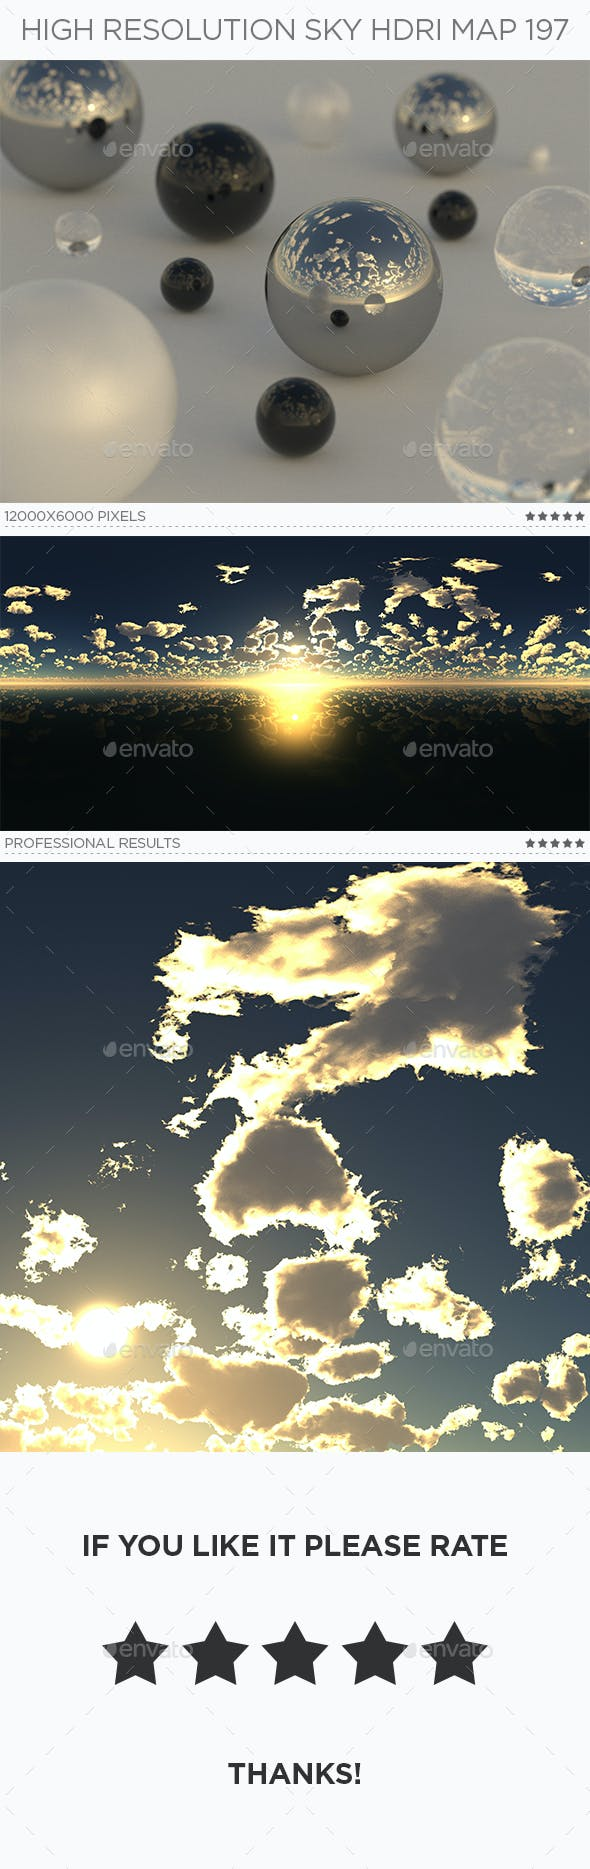 High Resolution Sky HDRi Map 197 - 3DOcean Item for Sale